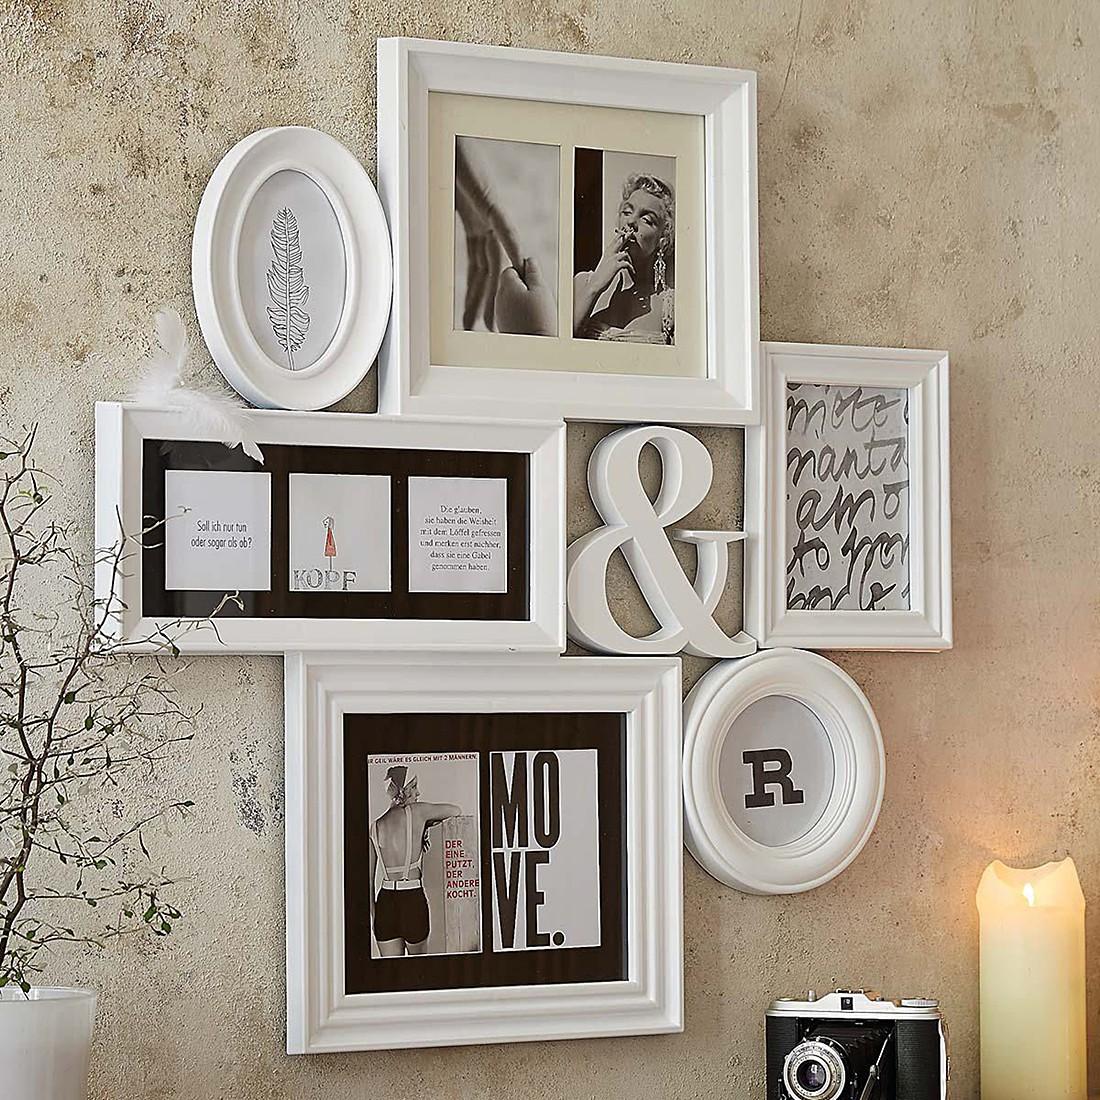 Post-it Halter Din - Edelstahl, Blanke Design - Tipps vom Einrichter